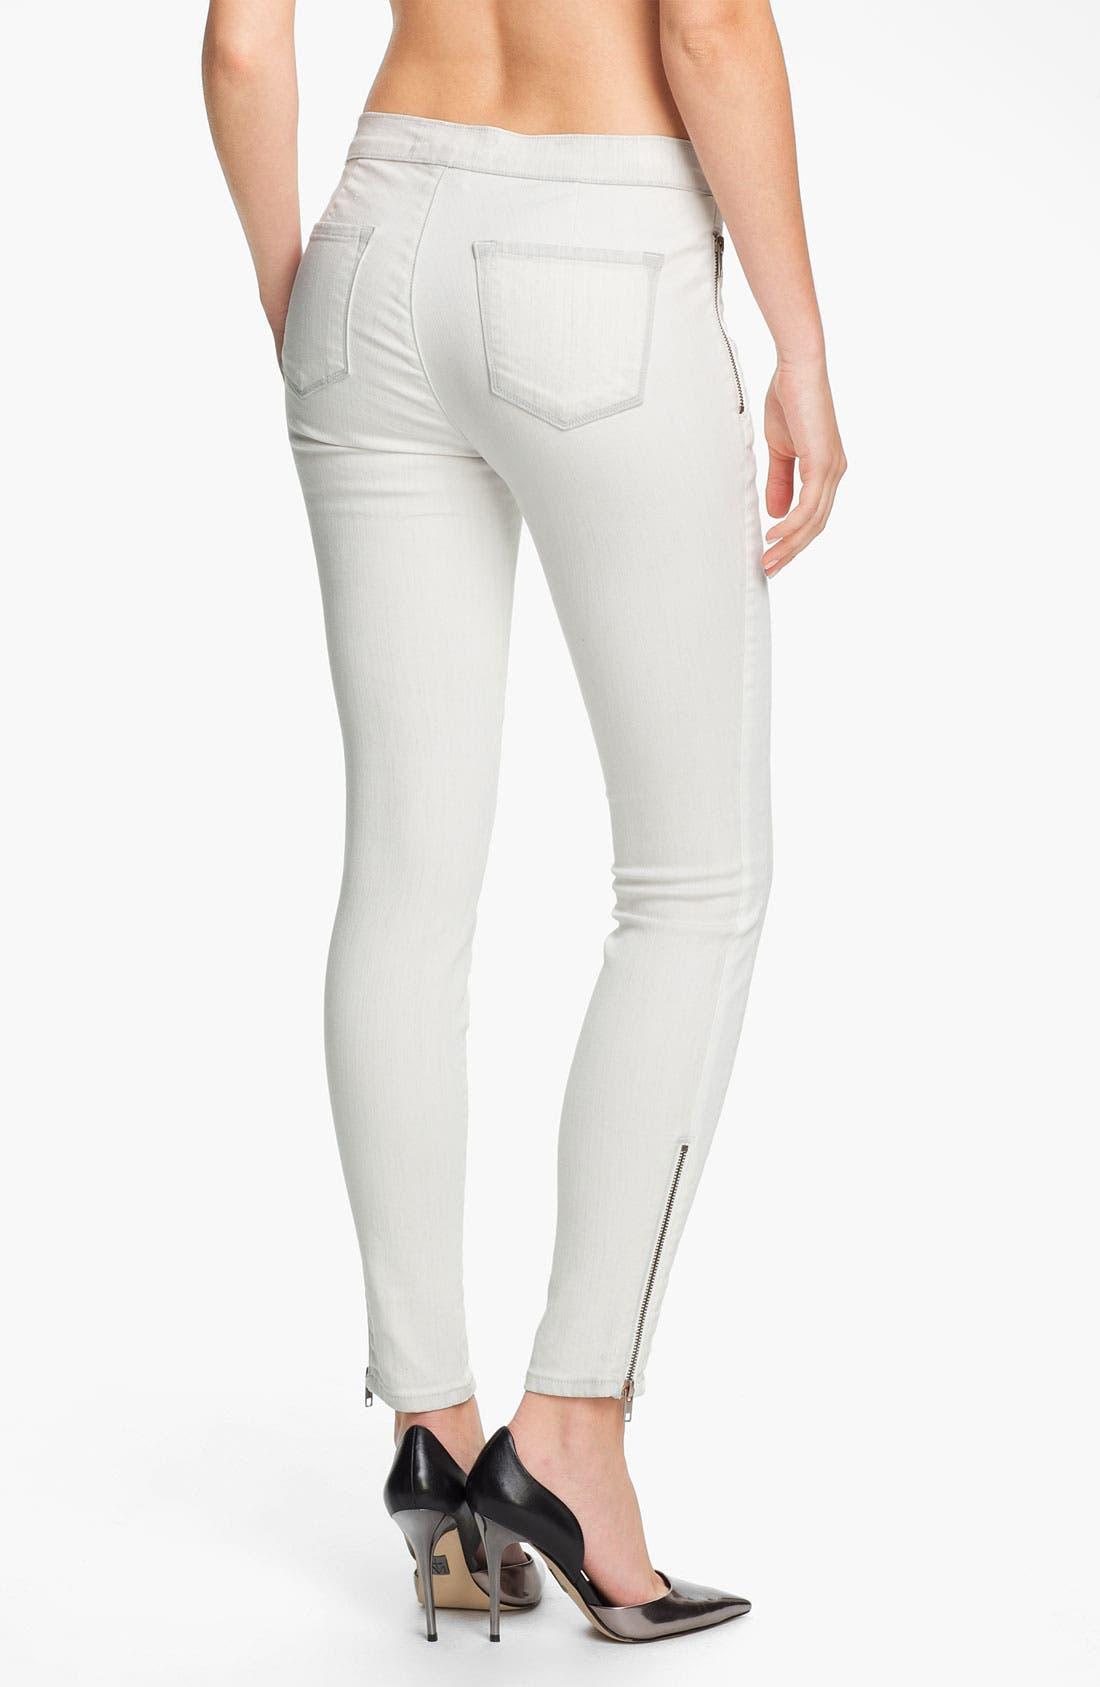 Alternate Image 2  - J Brand 'Kera' Tuxedo Stripe Skinny Jeans (Iceberg)